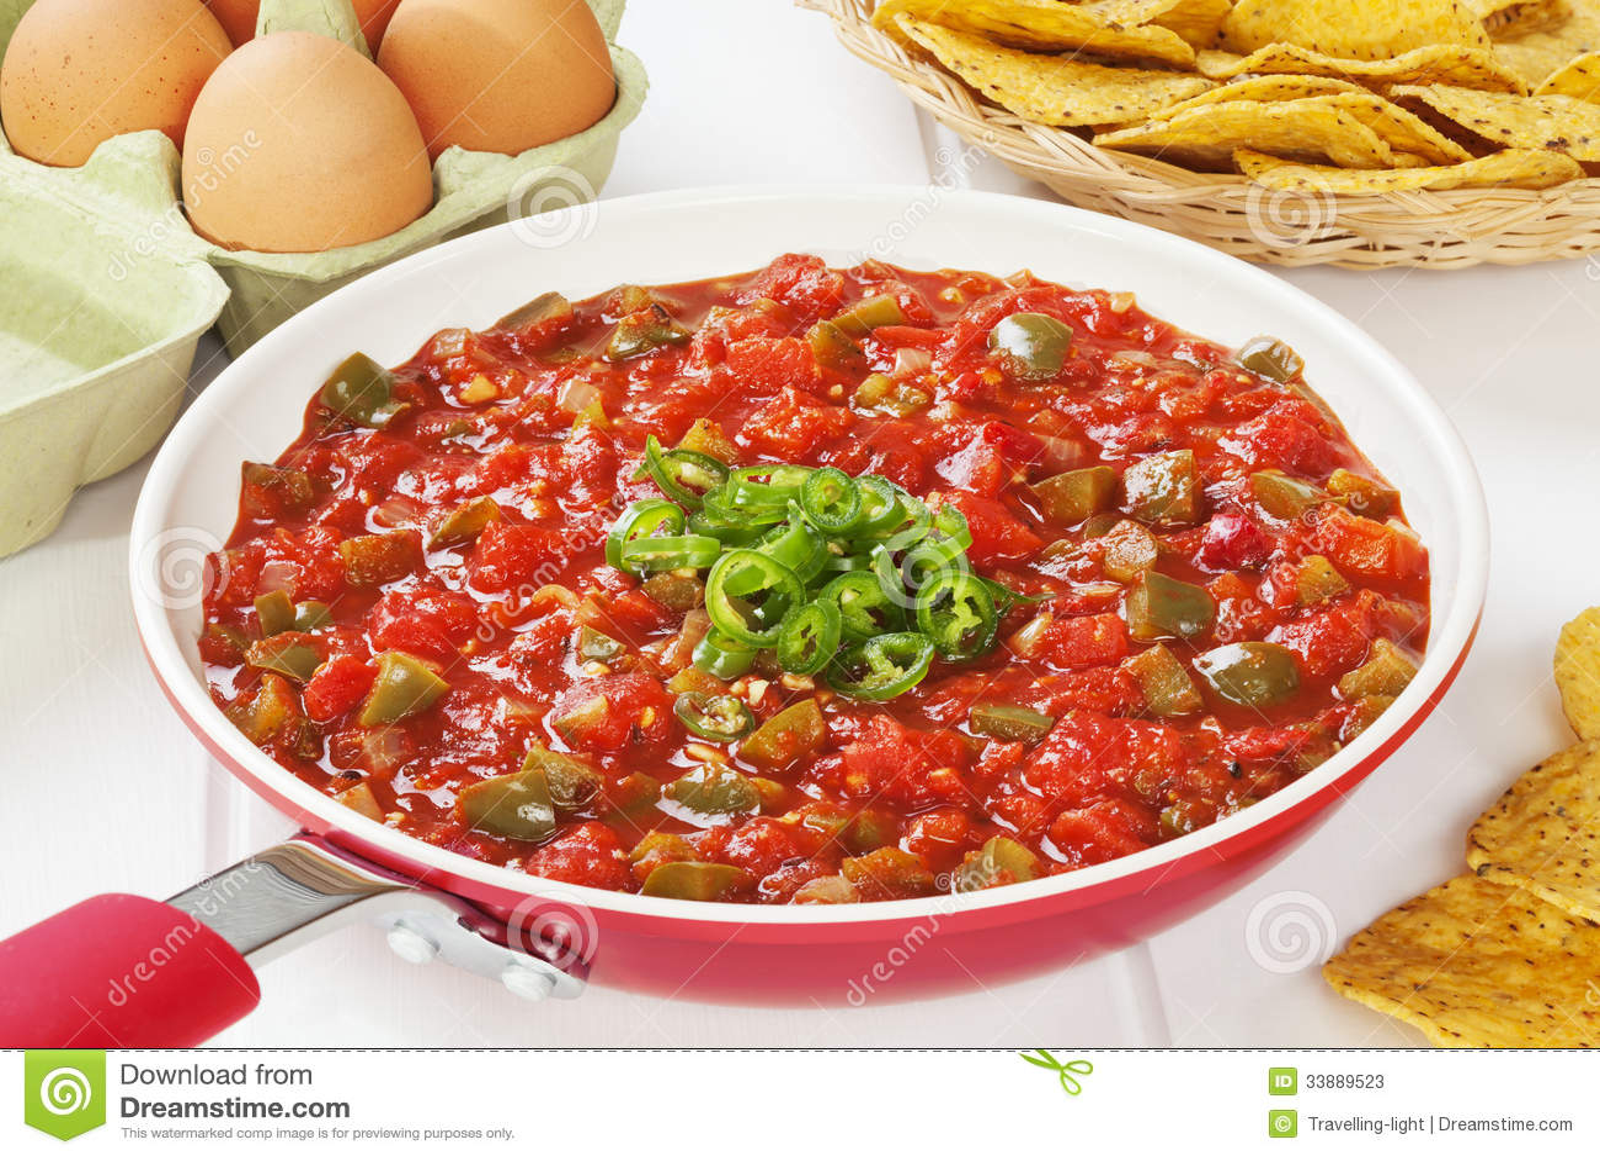 Mexican Food Tomato Salsa